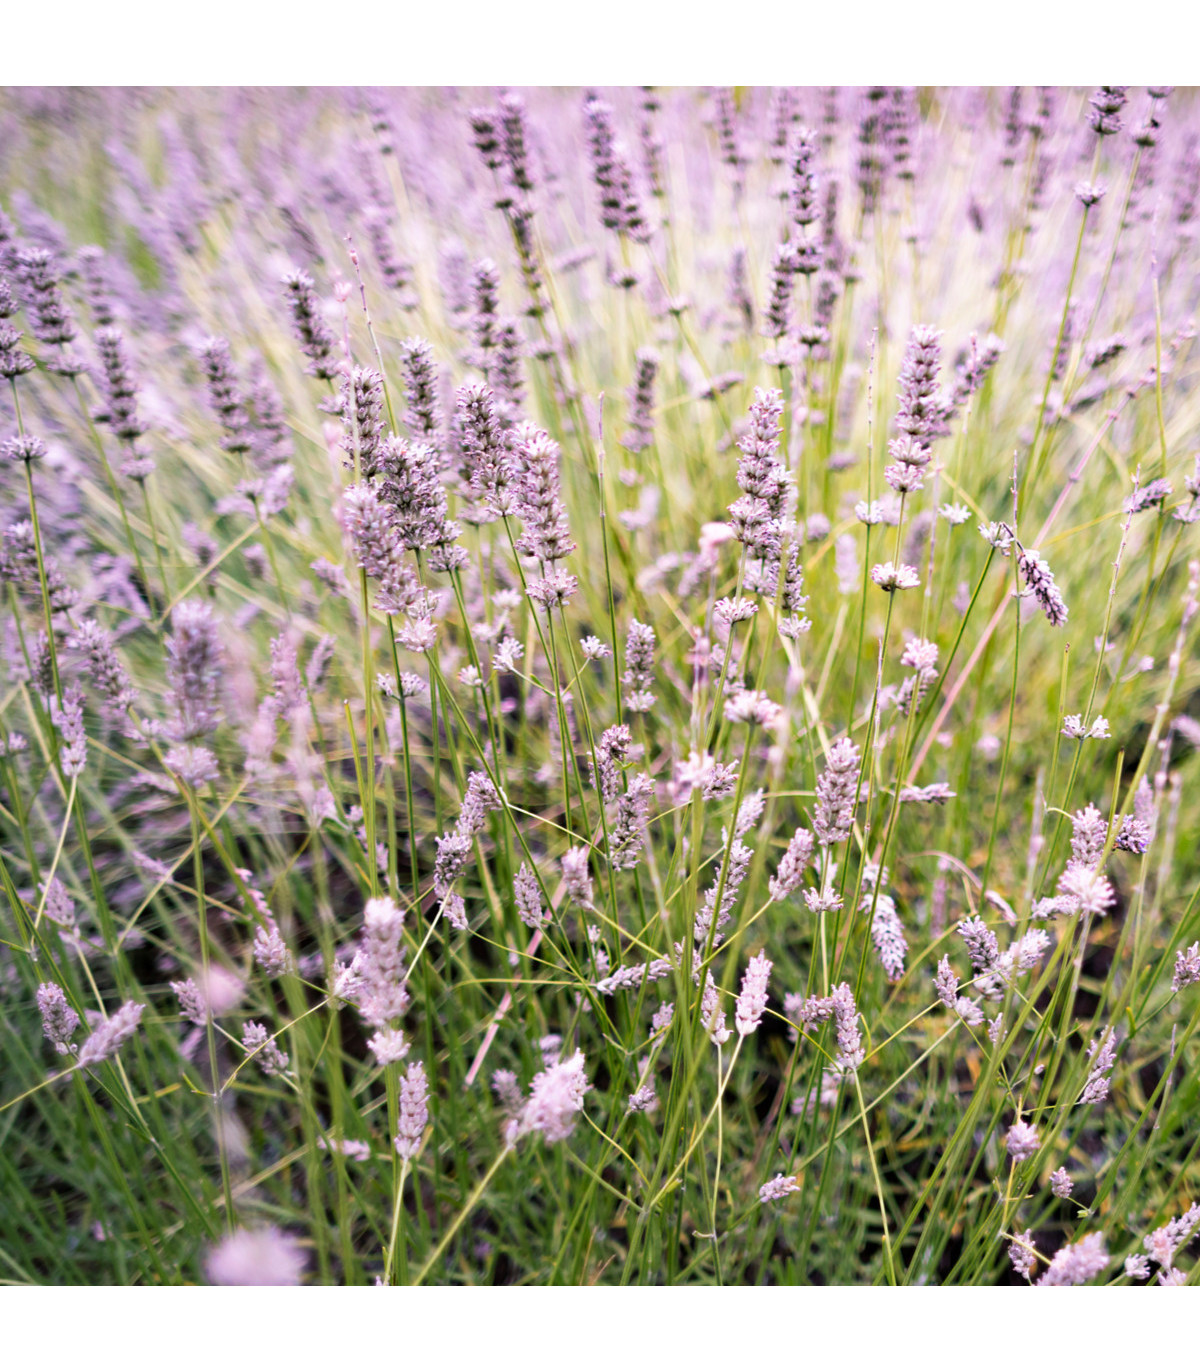 Levanduľa lekárska ružová ŠPECIÁL - semená Levandule - Lavandula angustifolia  - 50 ks